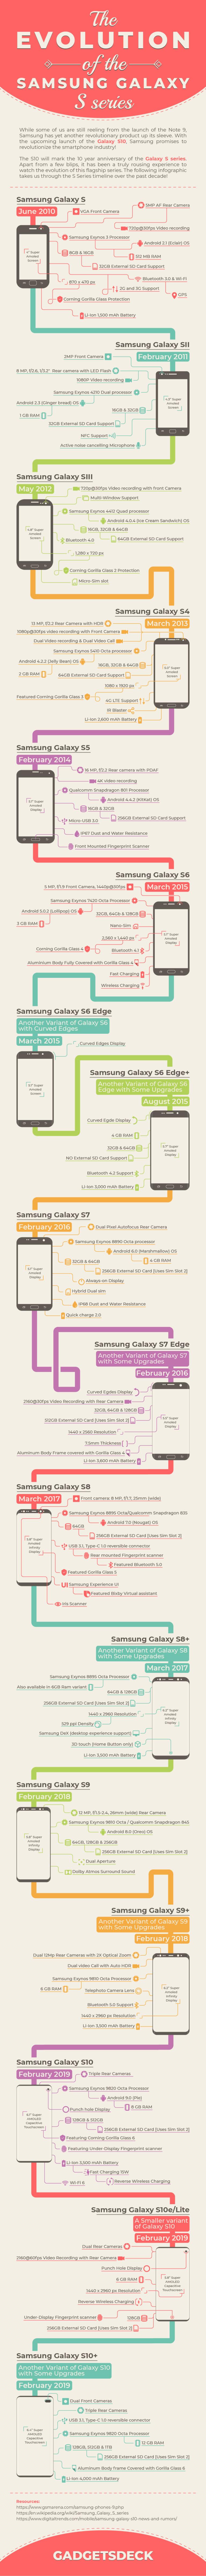 Samsung Galaxy S - storia